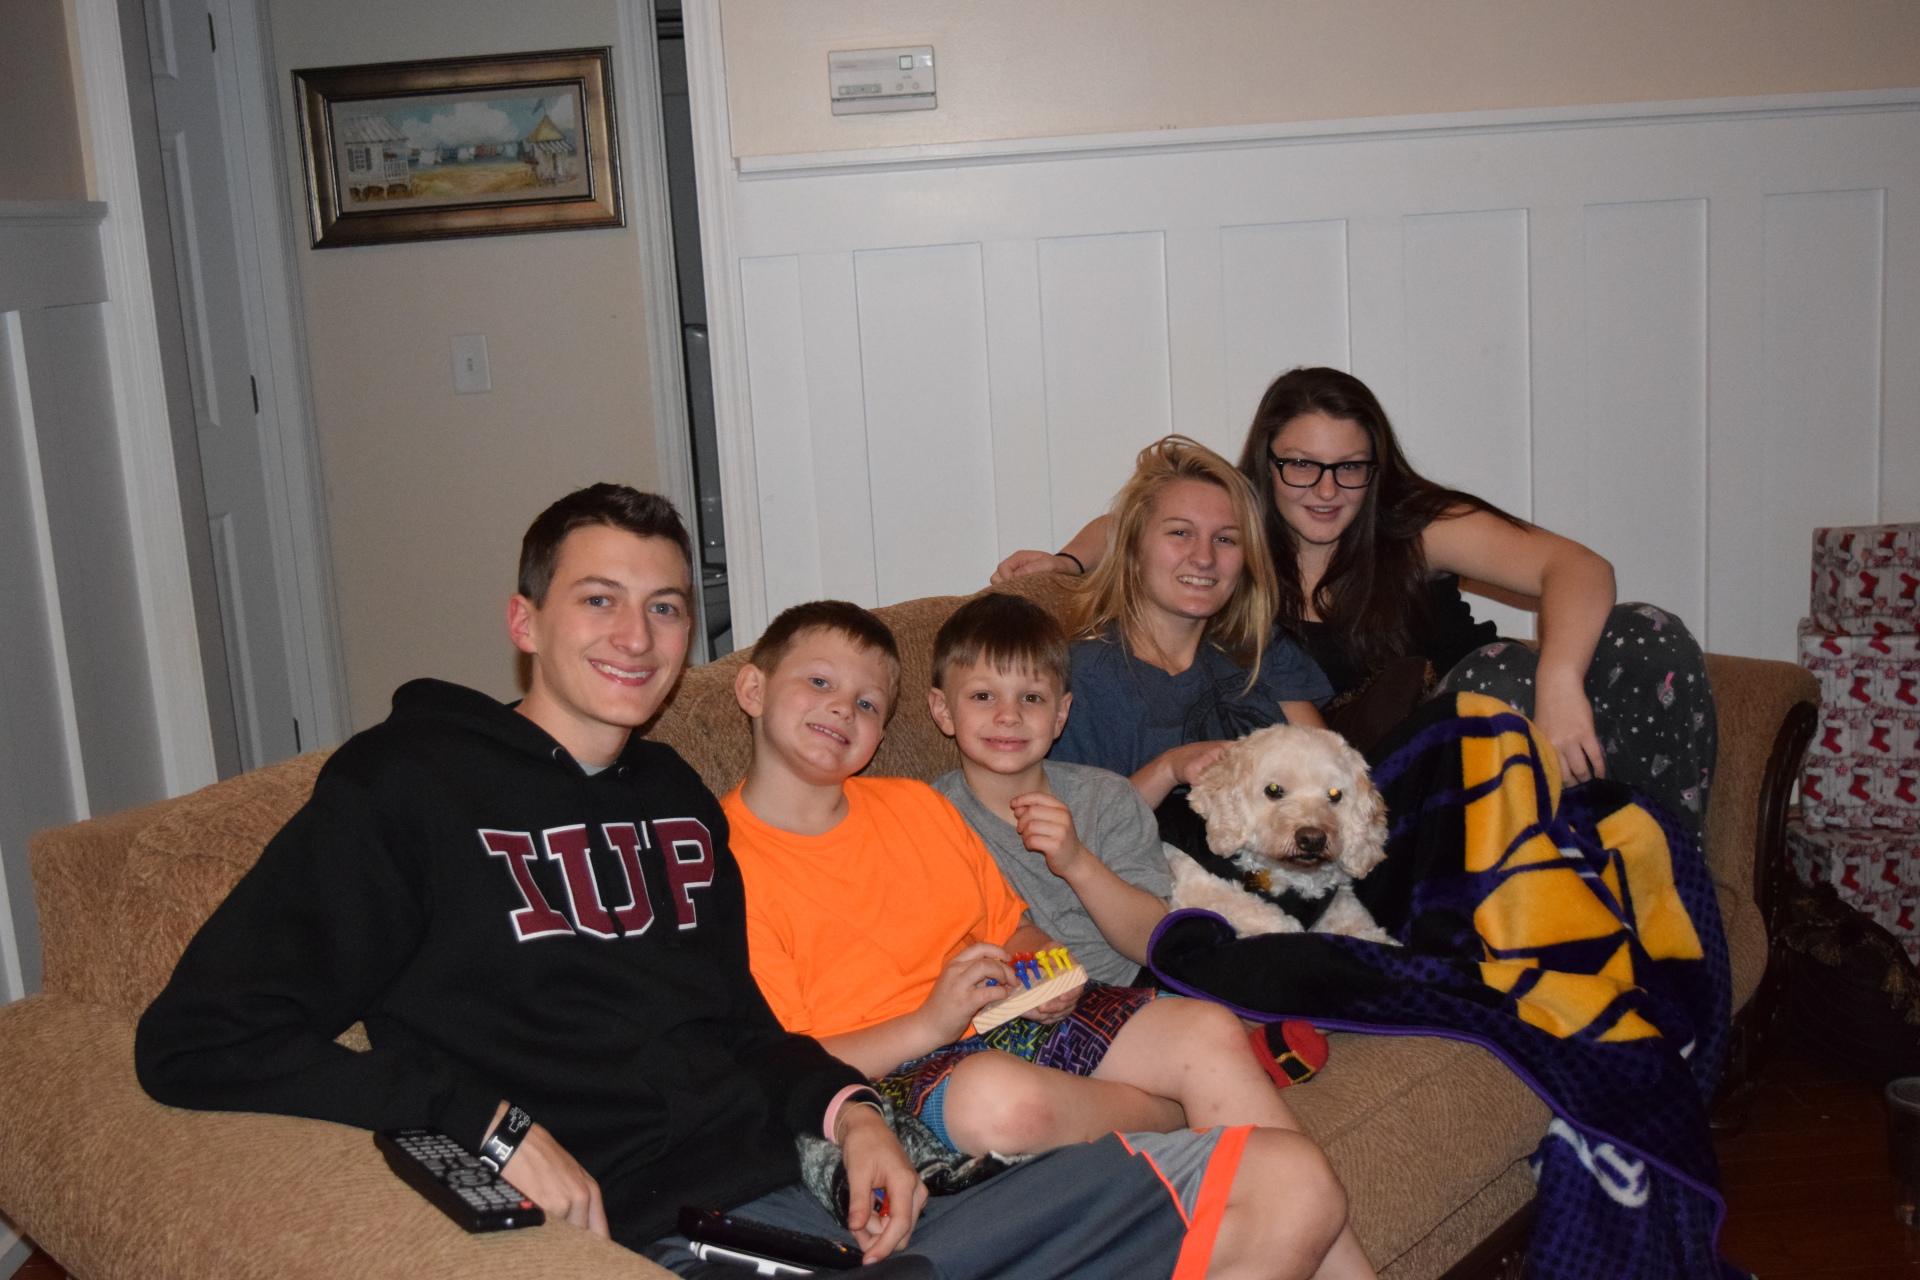 5 of the 6 Children